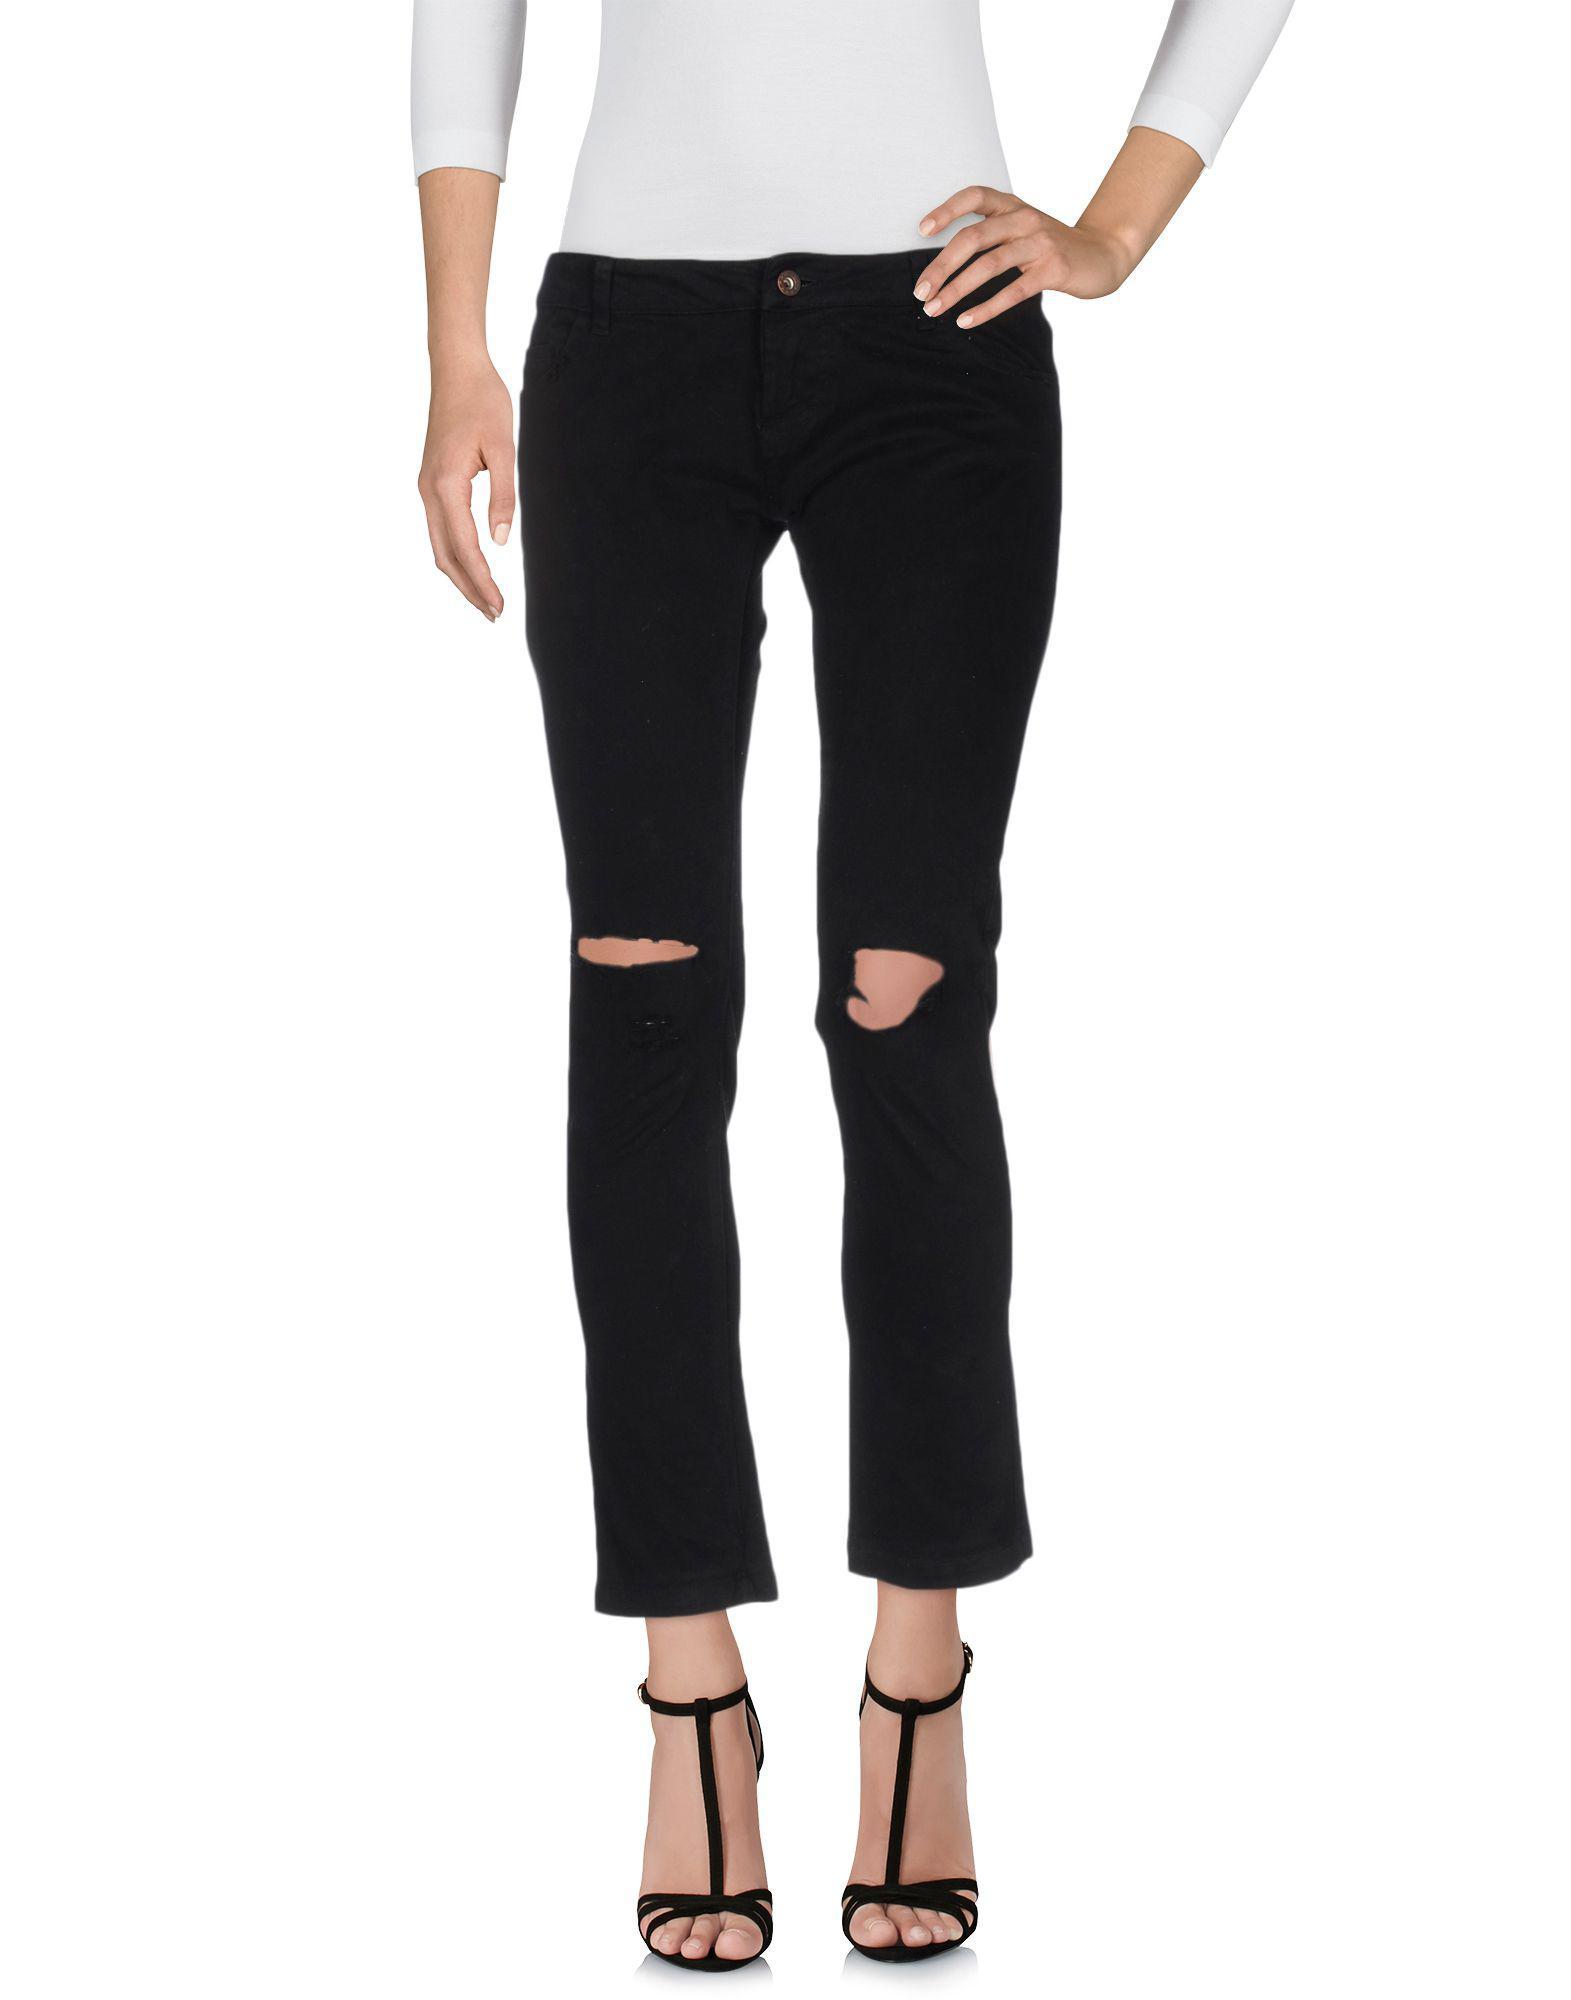 DENIM - Denim trousers Macchia j Cheap Really vgkZx